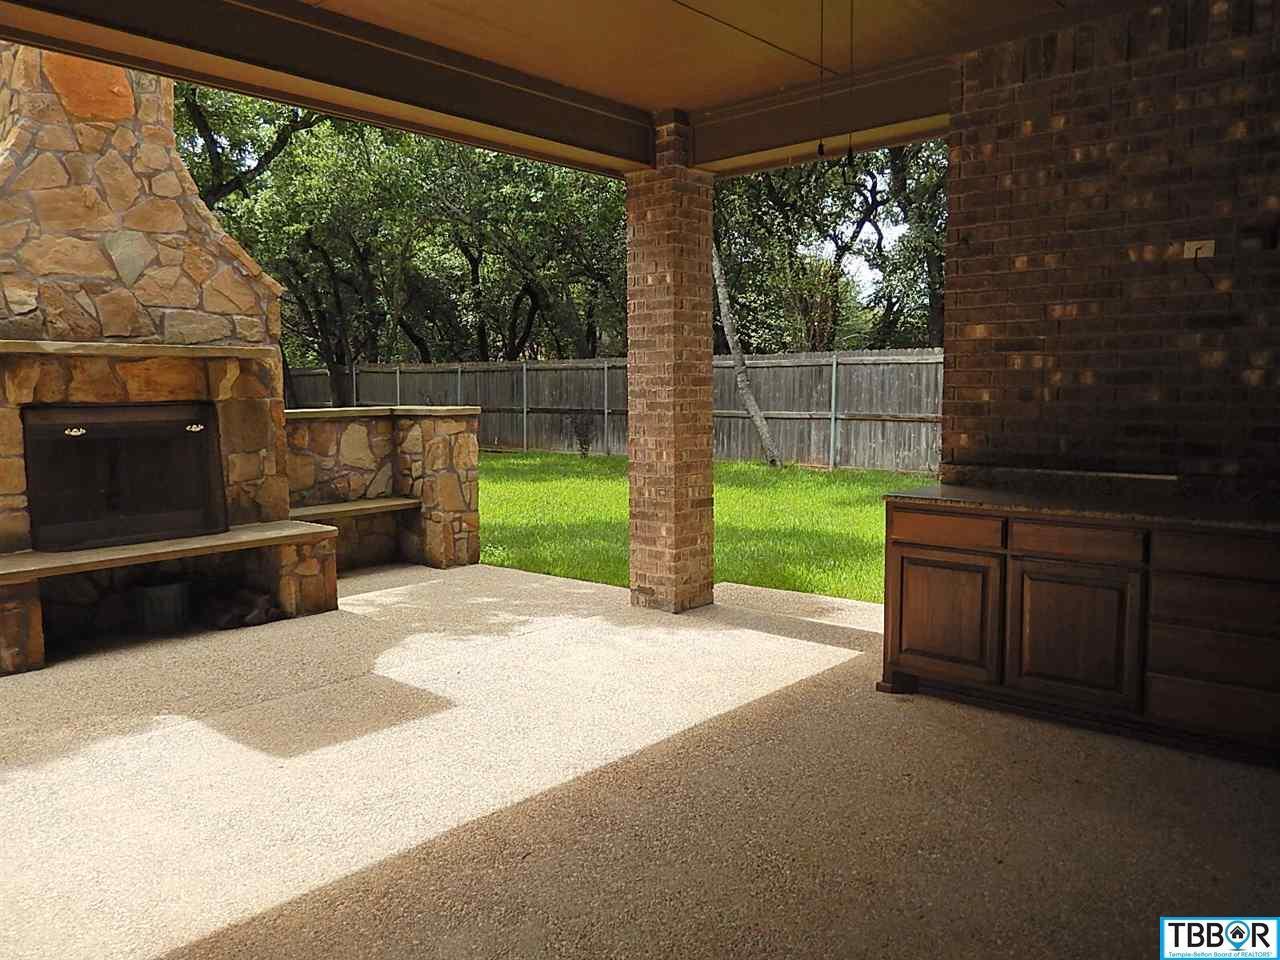 13280 Marigold, Belton TX 76513 - Photo 2